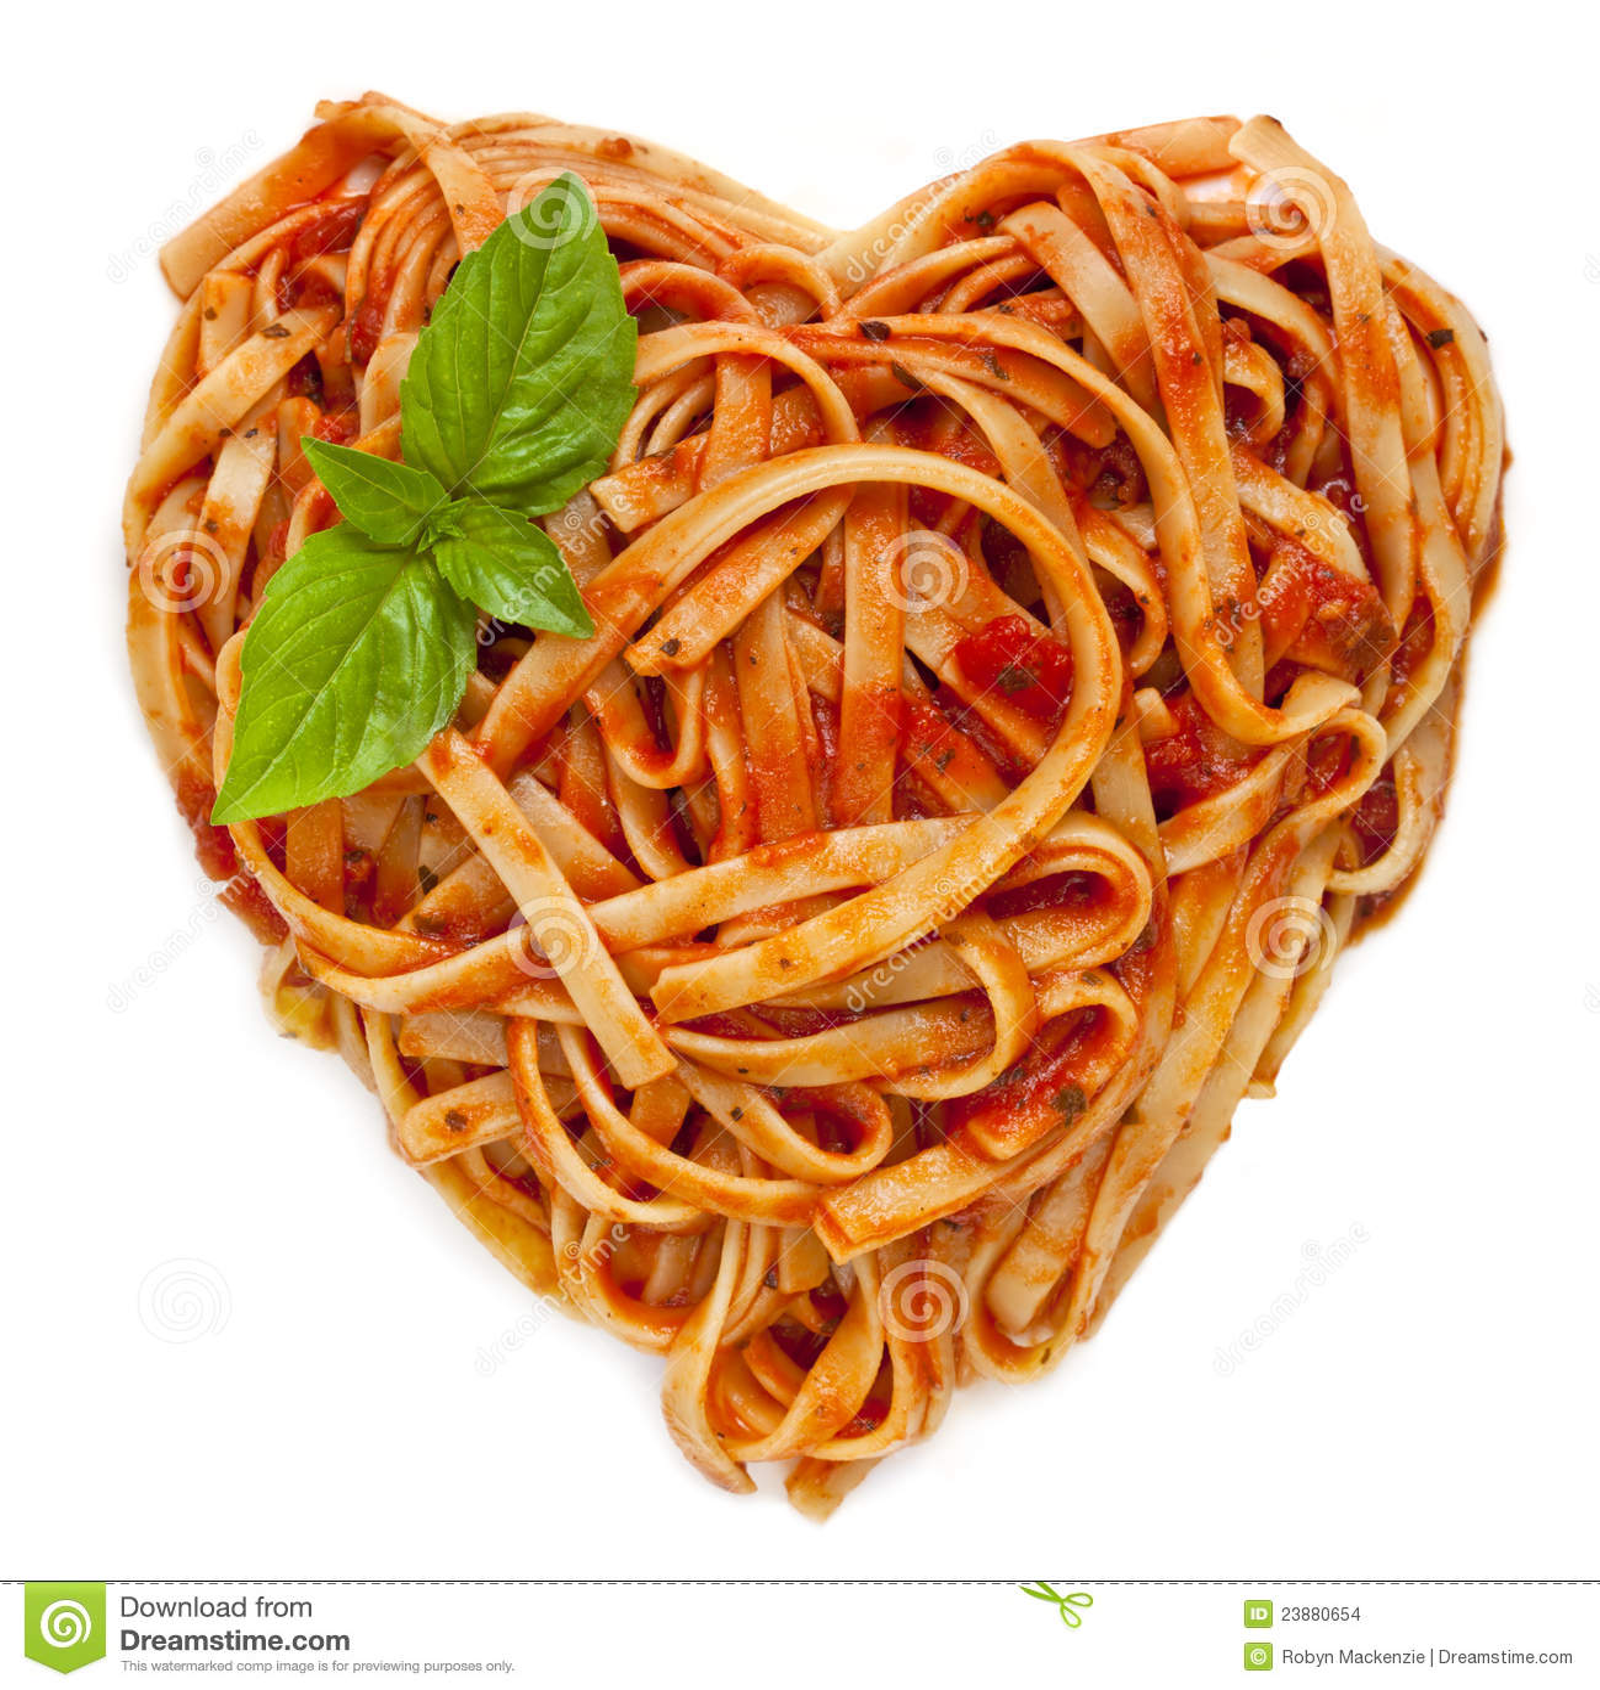 Pasta plate with cum - 2 part 4